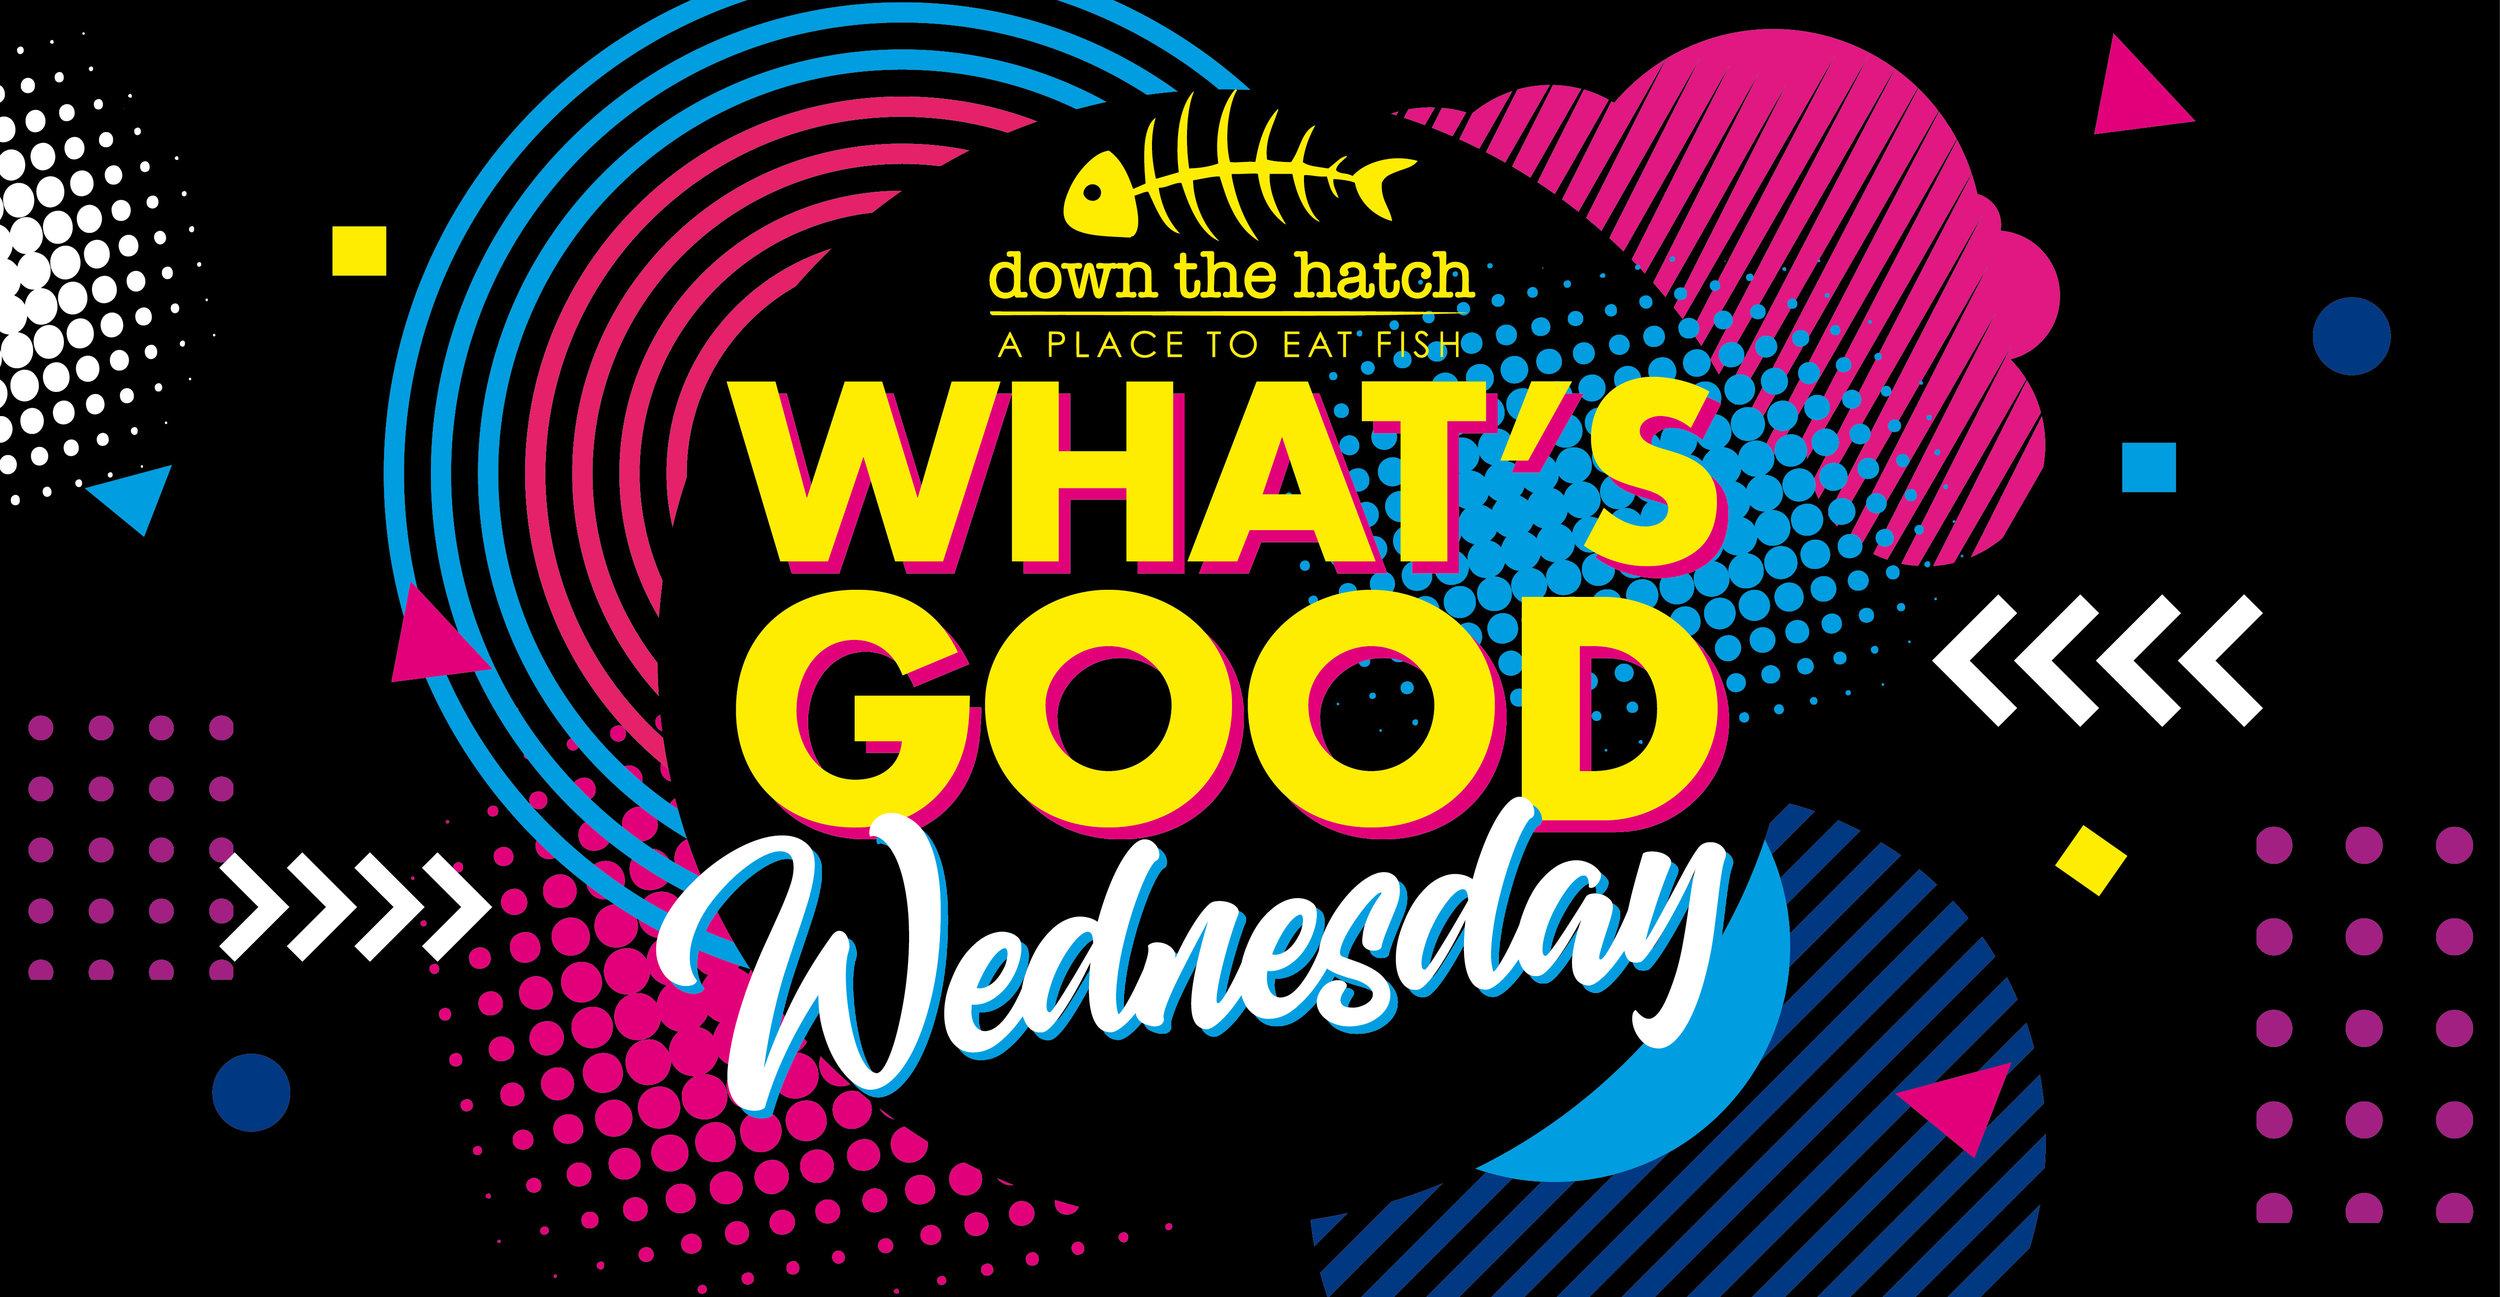 03-01 WHATS GOOD WEDNESDAY FACEBOOK.jpg